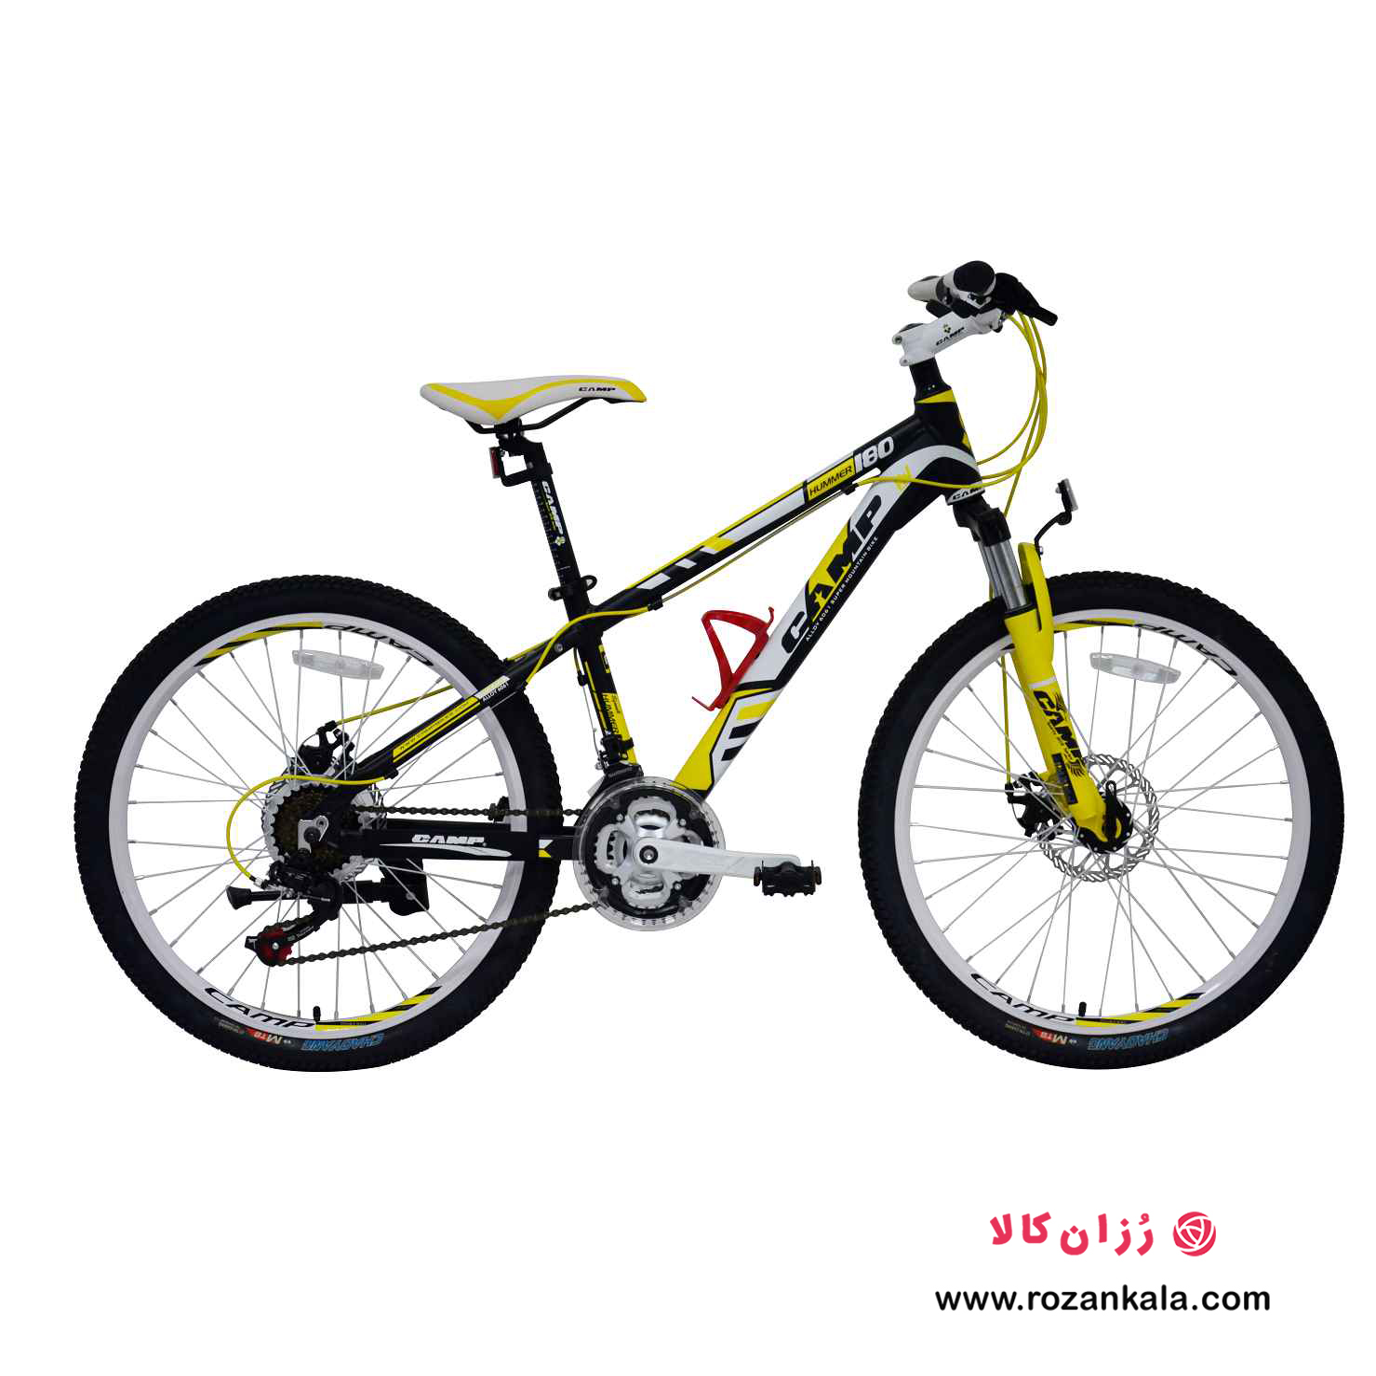 دوچرخه  HUMMER 180کمپ CAMP  سایز ۲۶ |